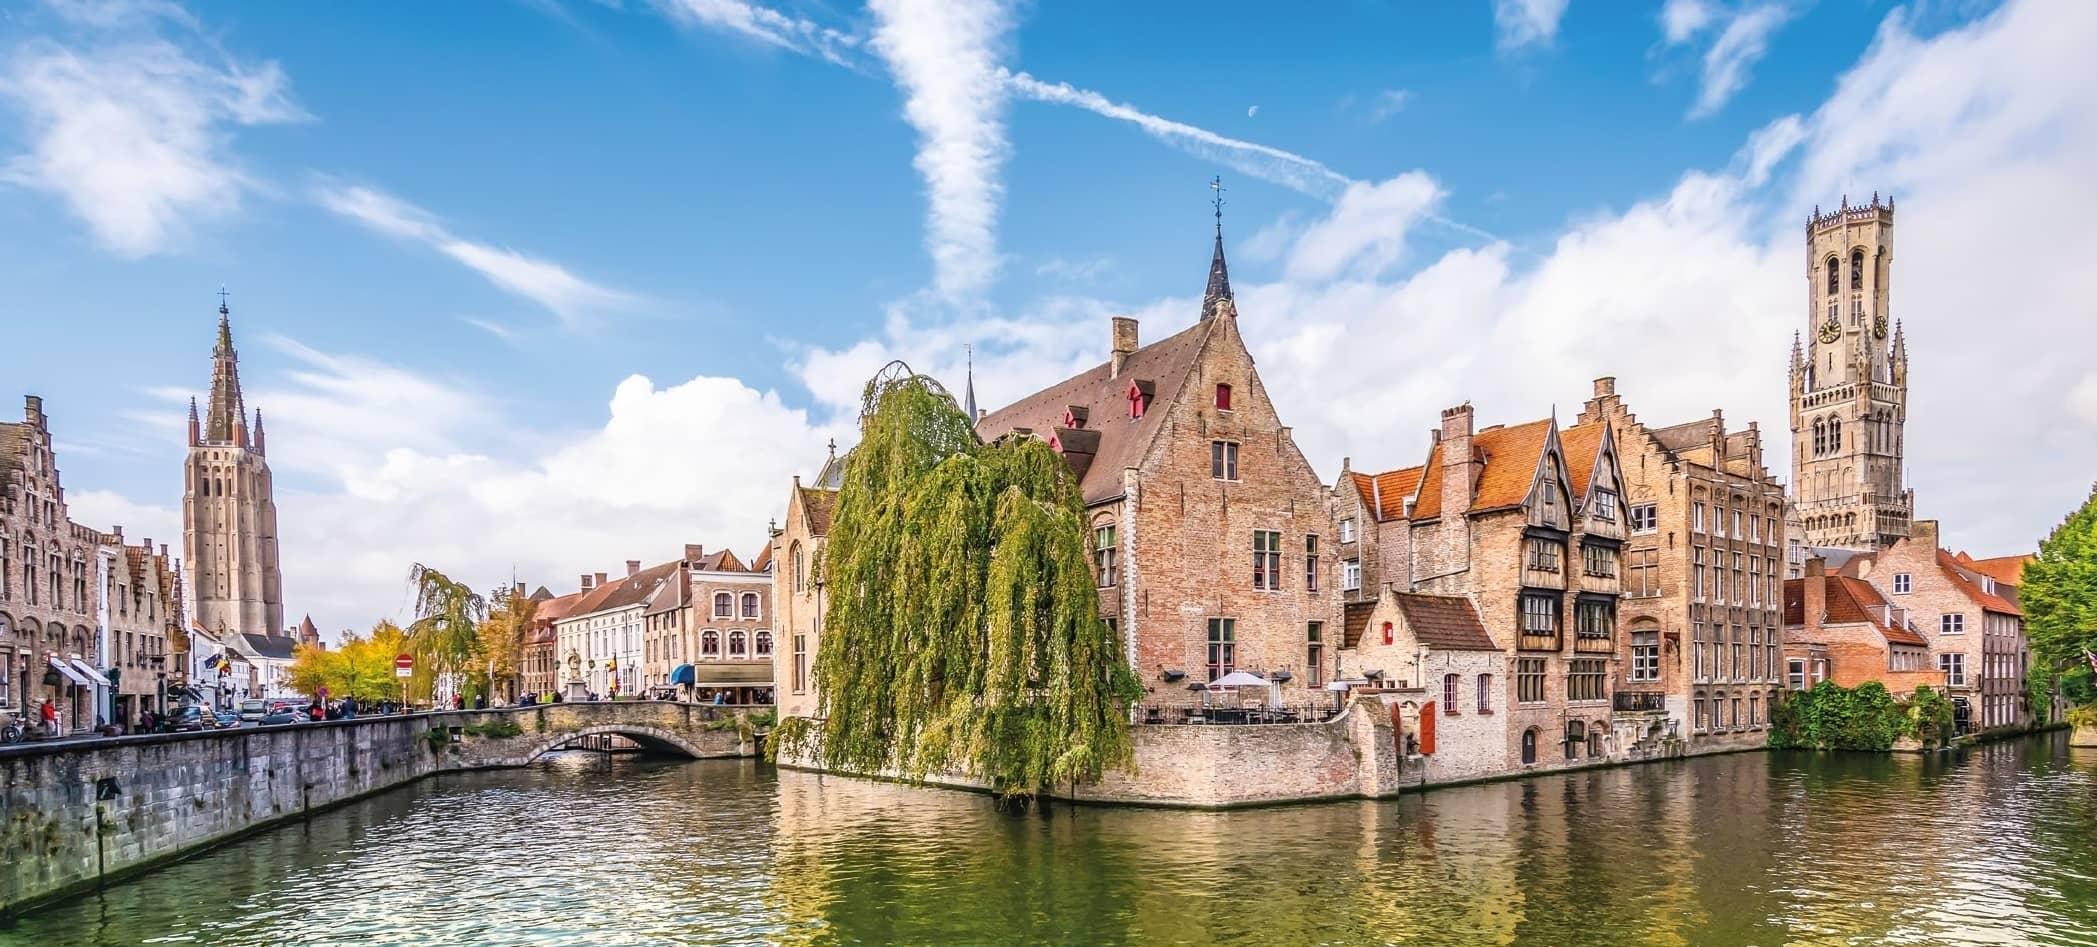 A Few Days in Bruges